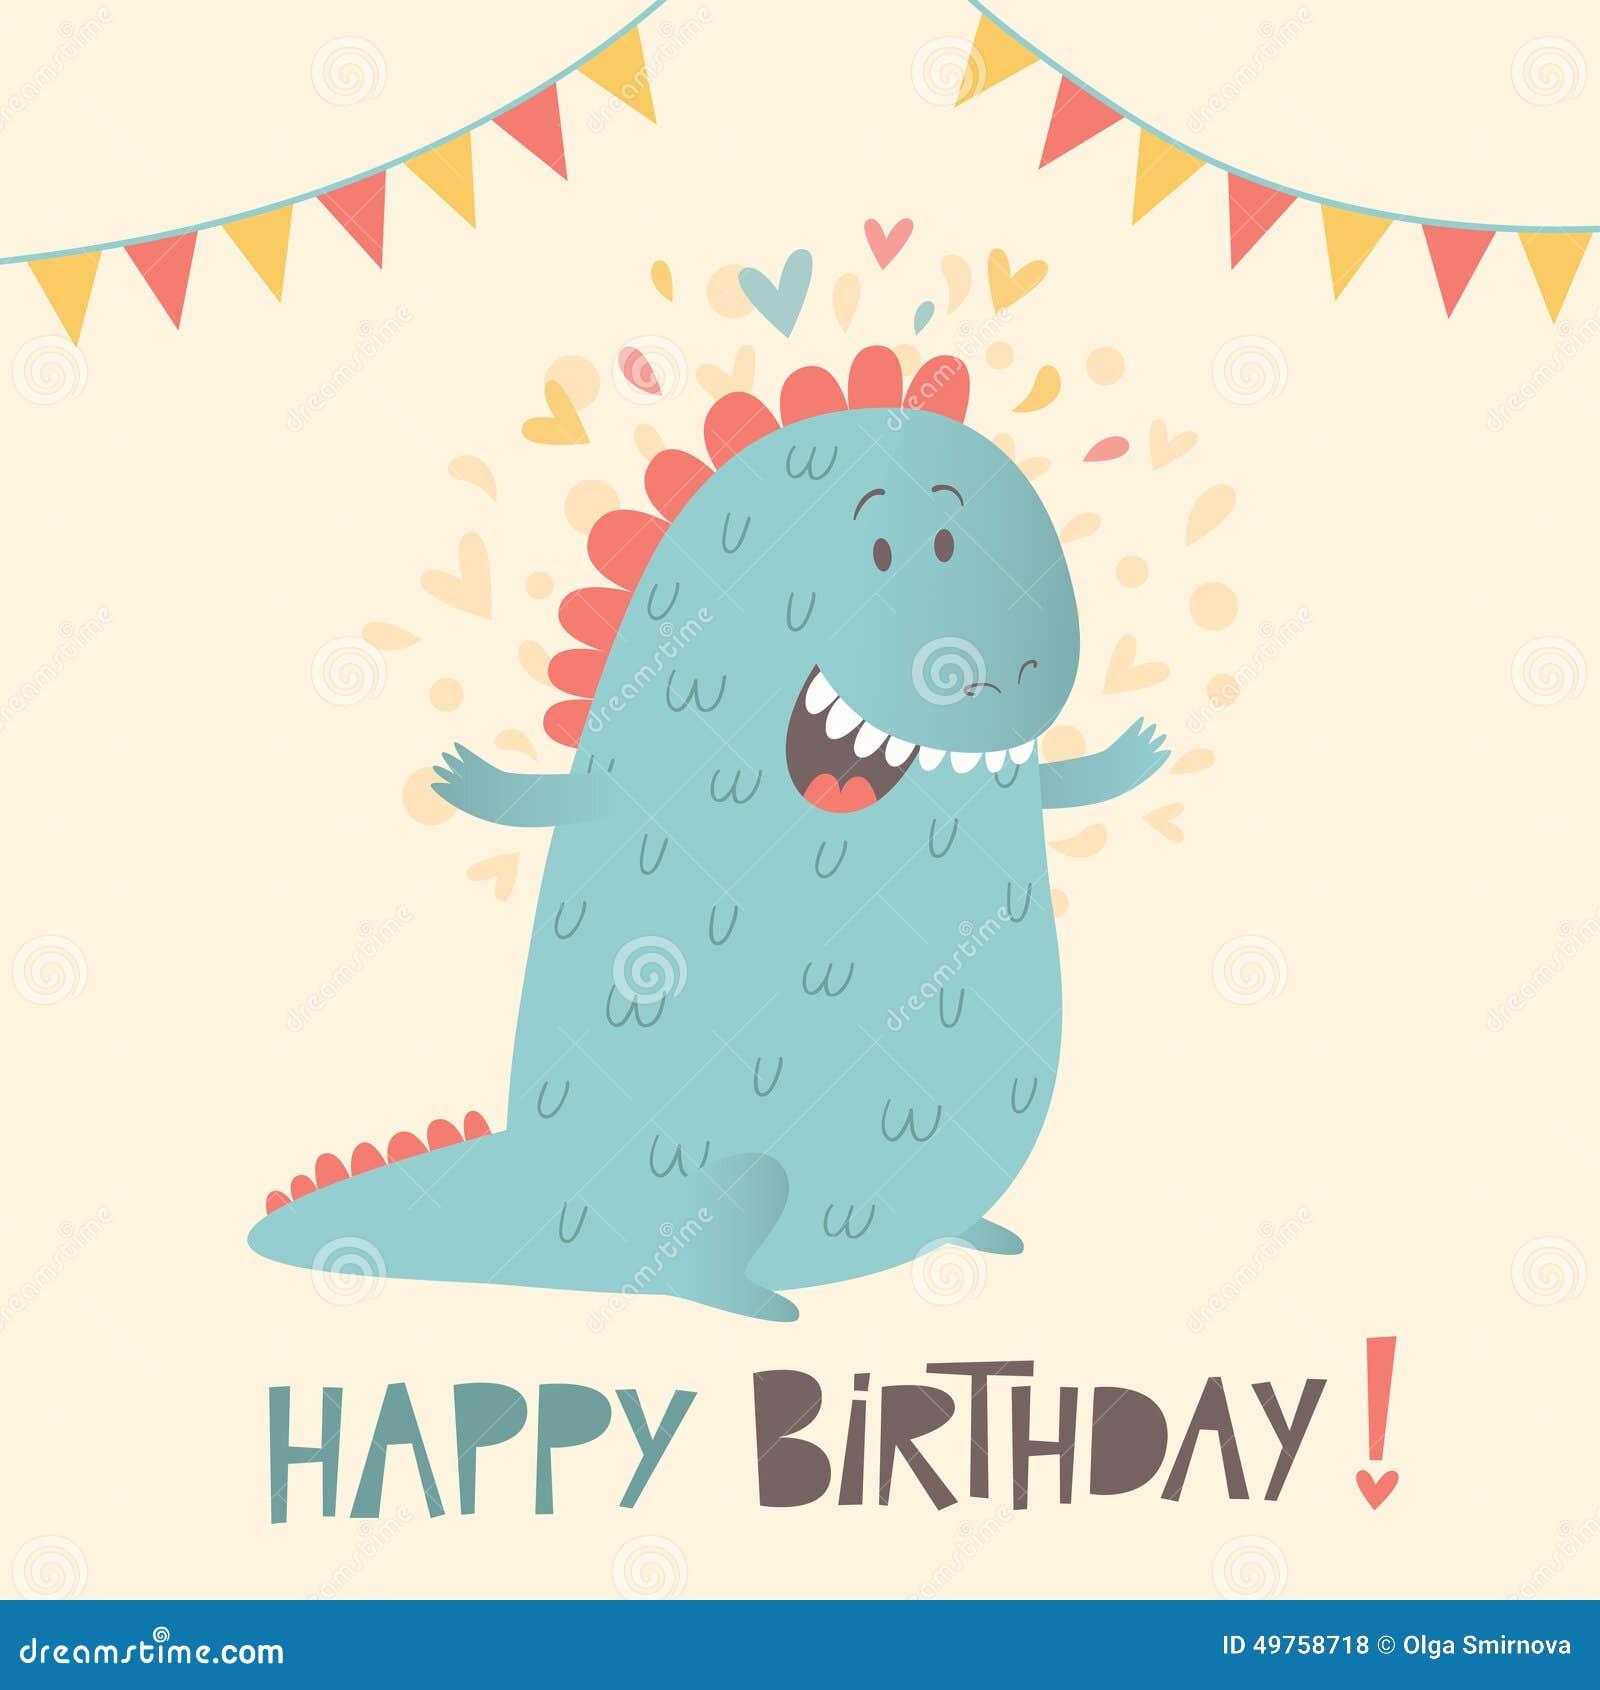 Happy Birthday Greeting Card With Cute Dinosaur Stock